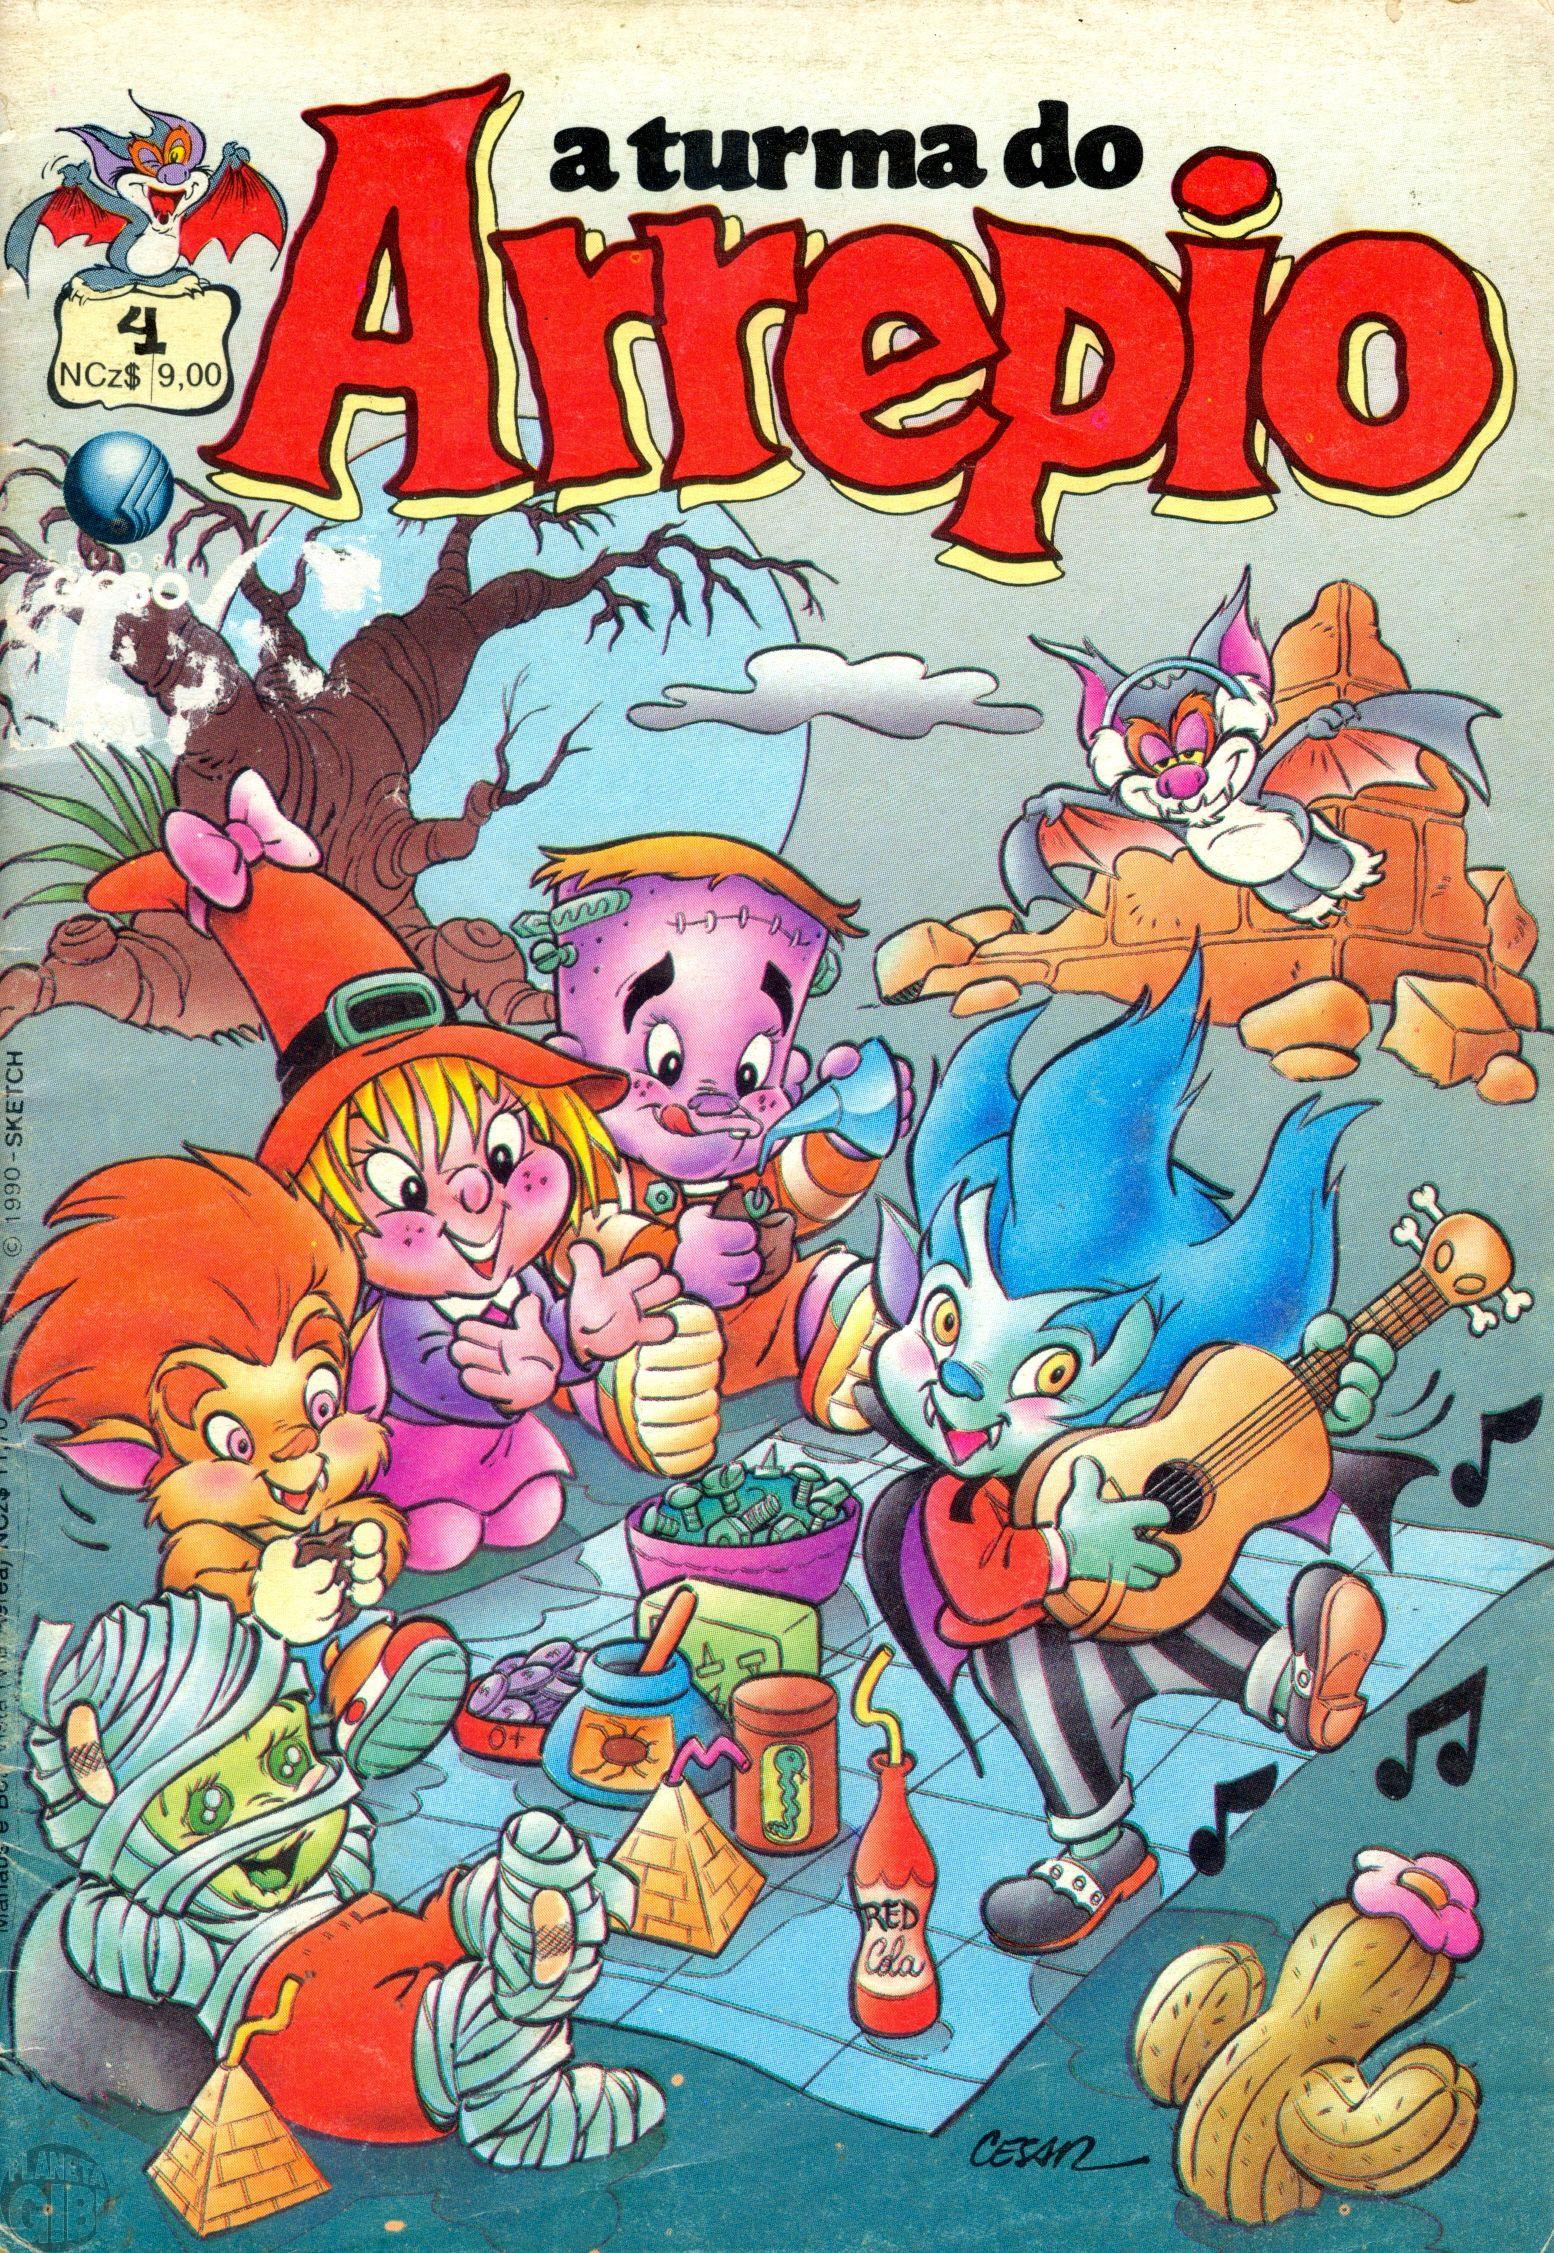 A Turma do Arrepio [Globo] nº 004 jan/1990